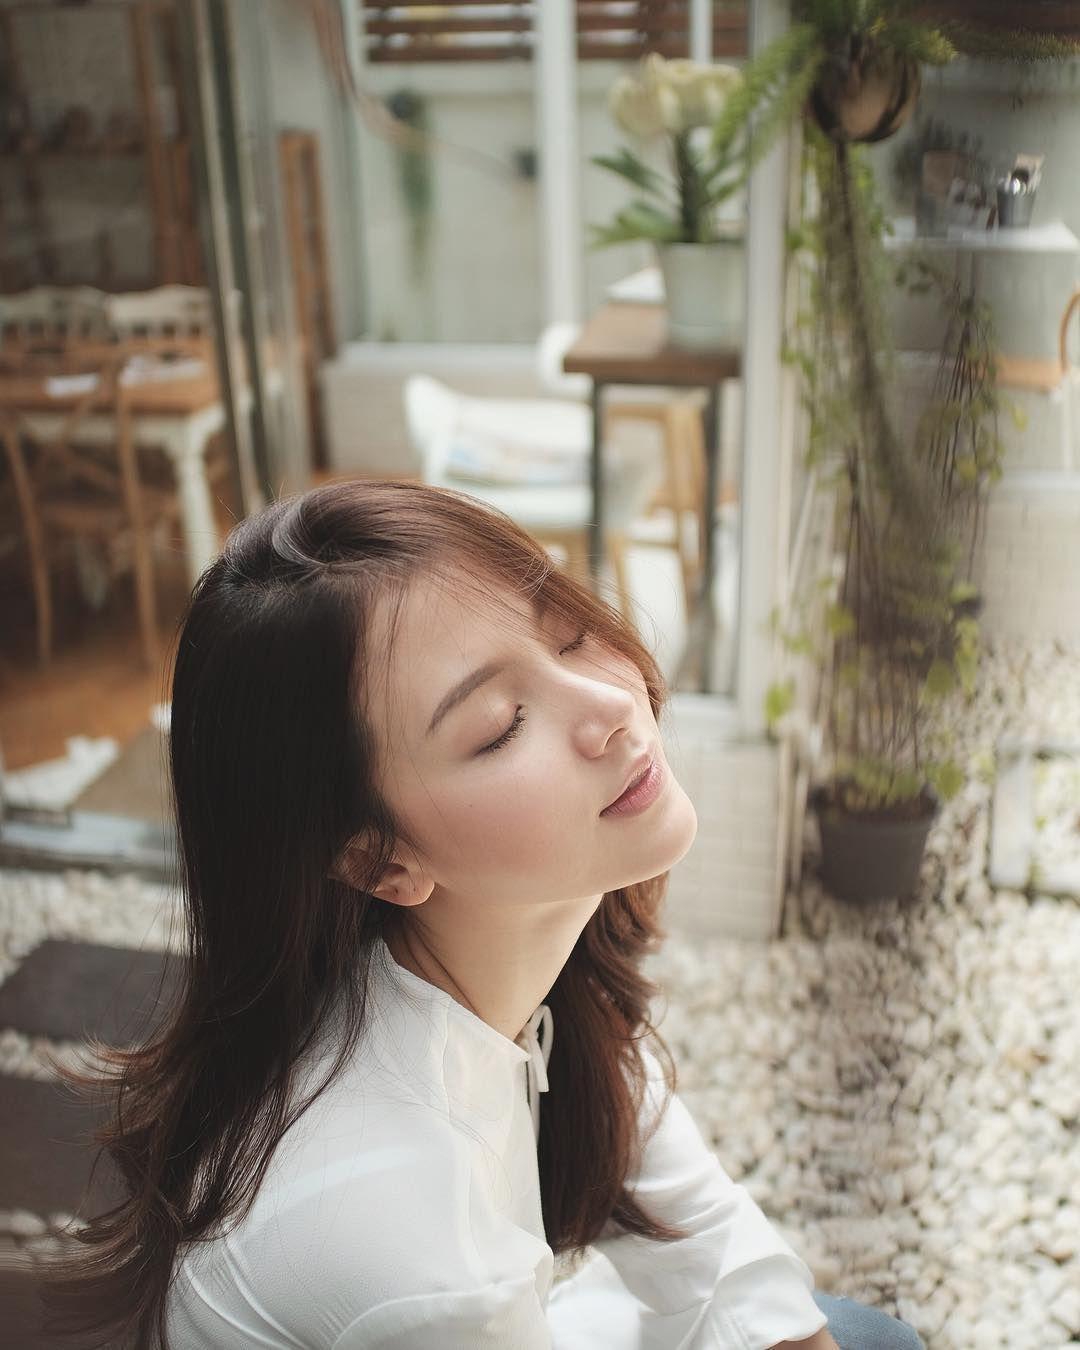 21 Baifern ideas   baifern pimchanok, asian beauty girl, beauty girl